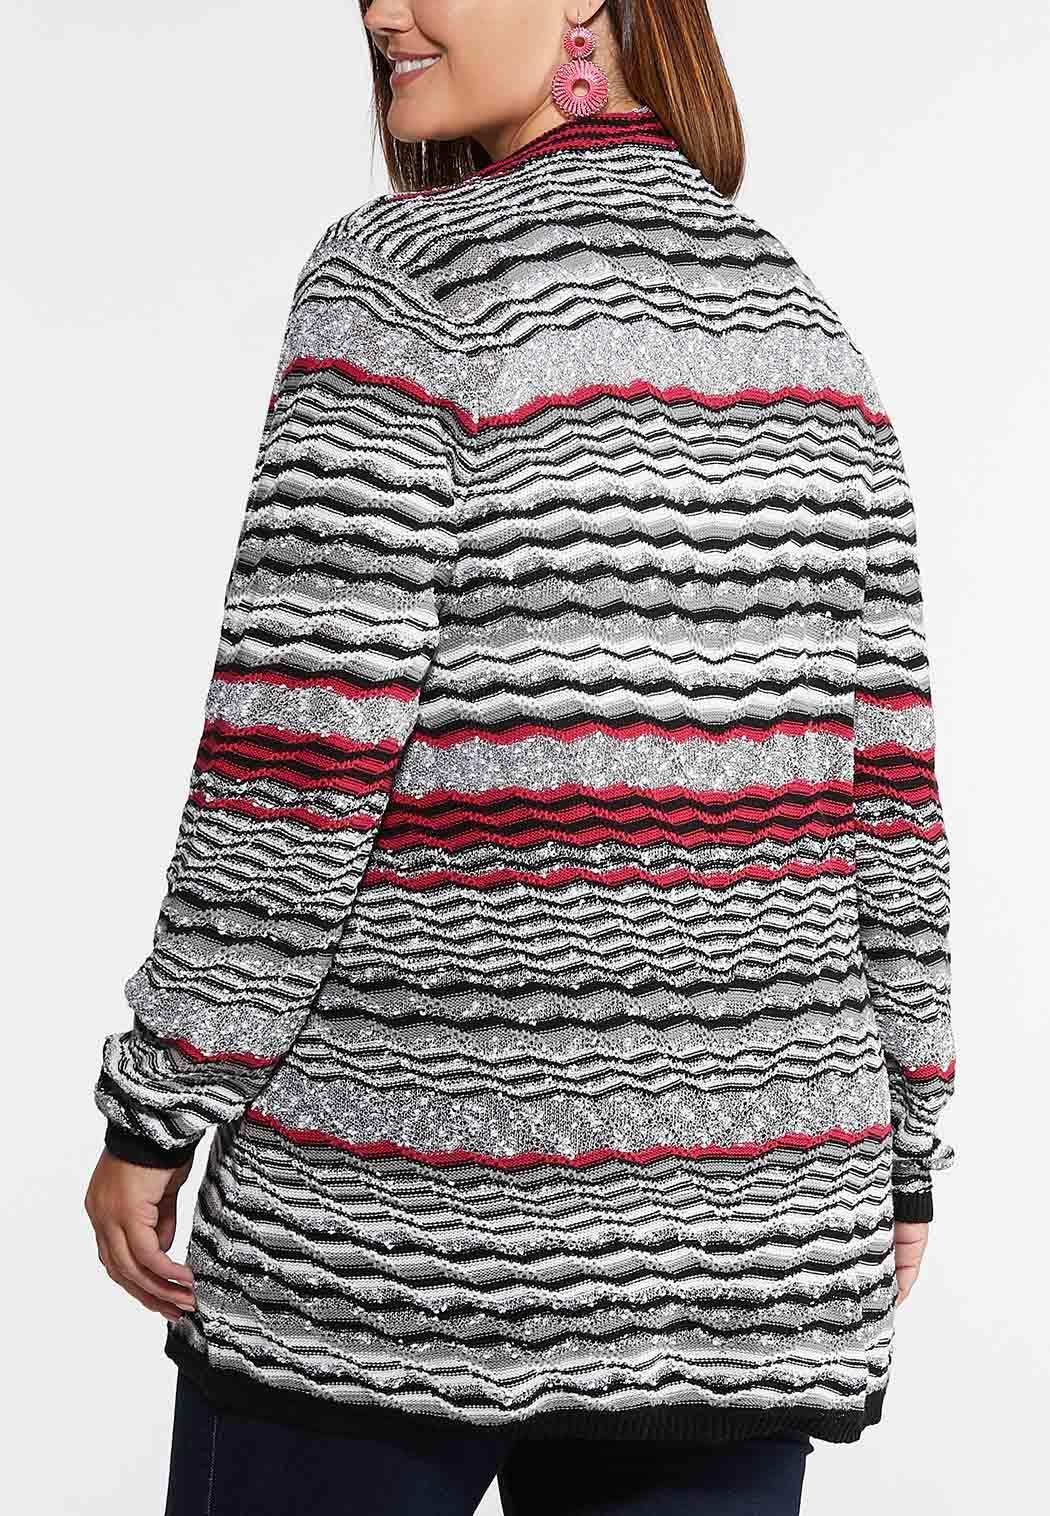 Plus Size Raspberry Wave Cardigan Sweater (Item #43991305)